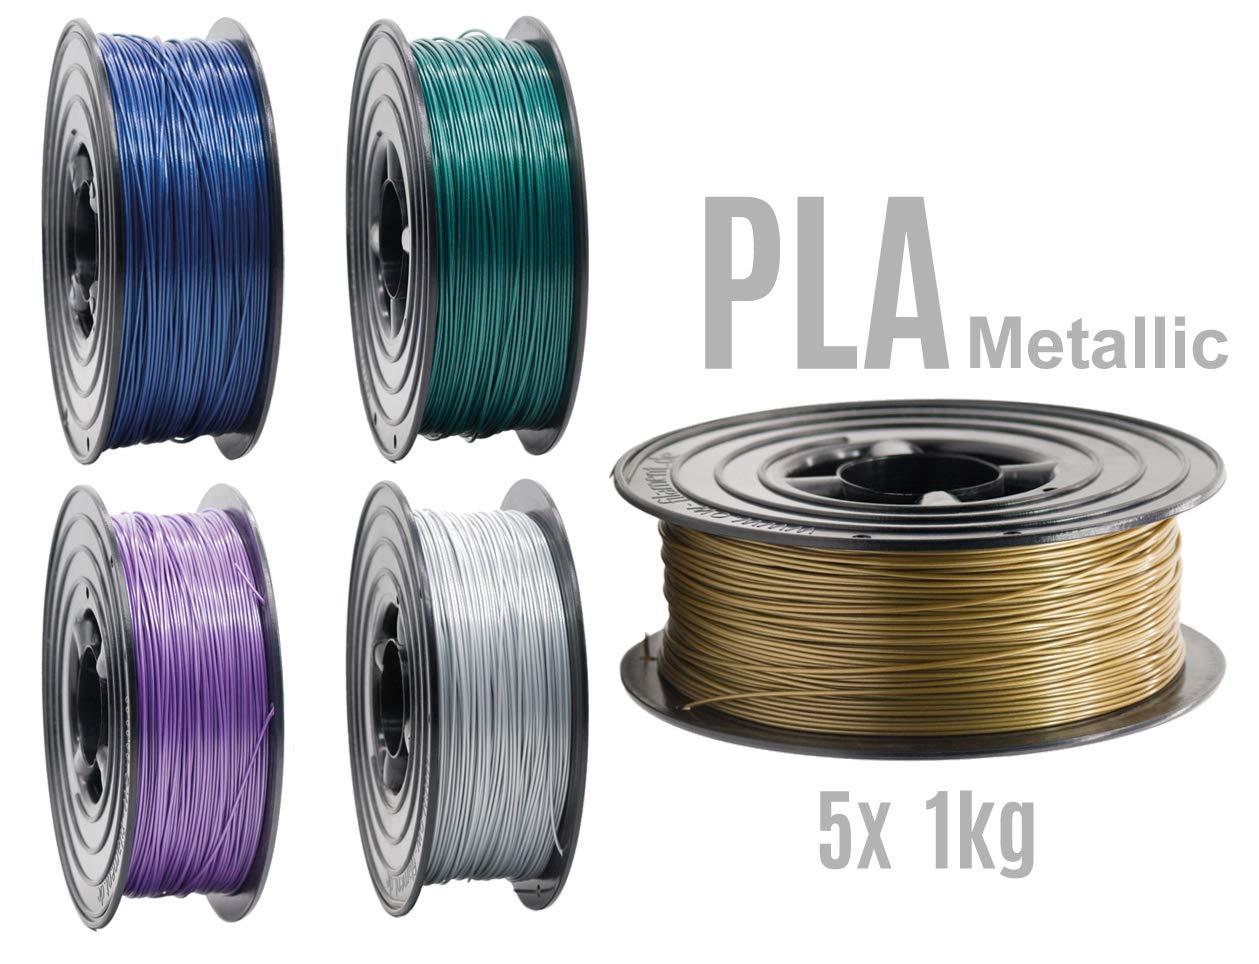 Filamento PLA para impresora 3D, 1,75 mm, 5 rollos de 1 kg, 5 ...